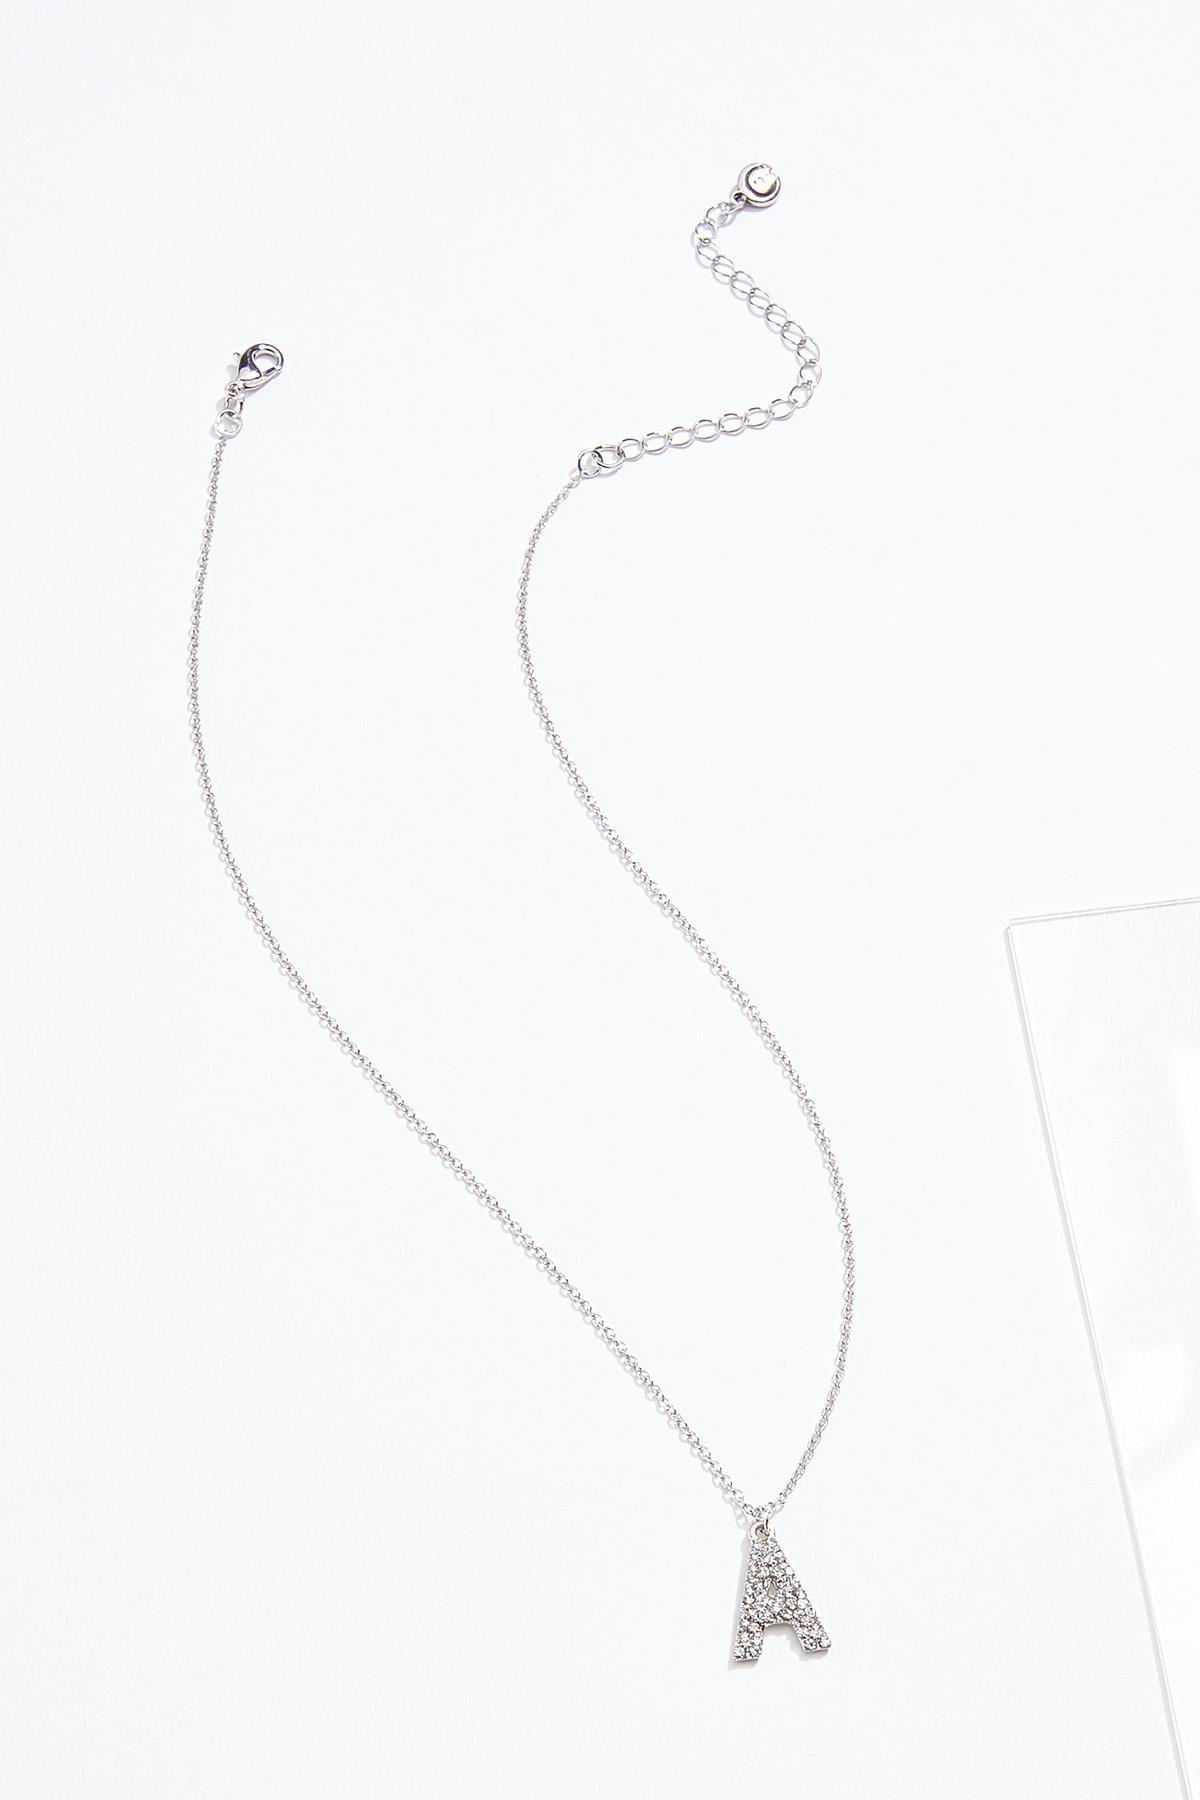 Rhinestone A Pendant Necklace